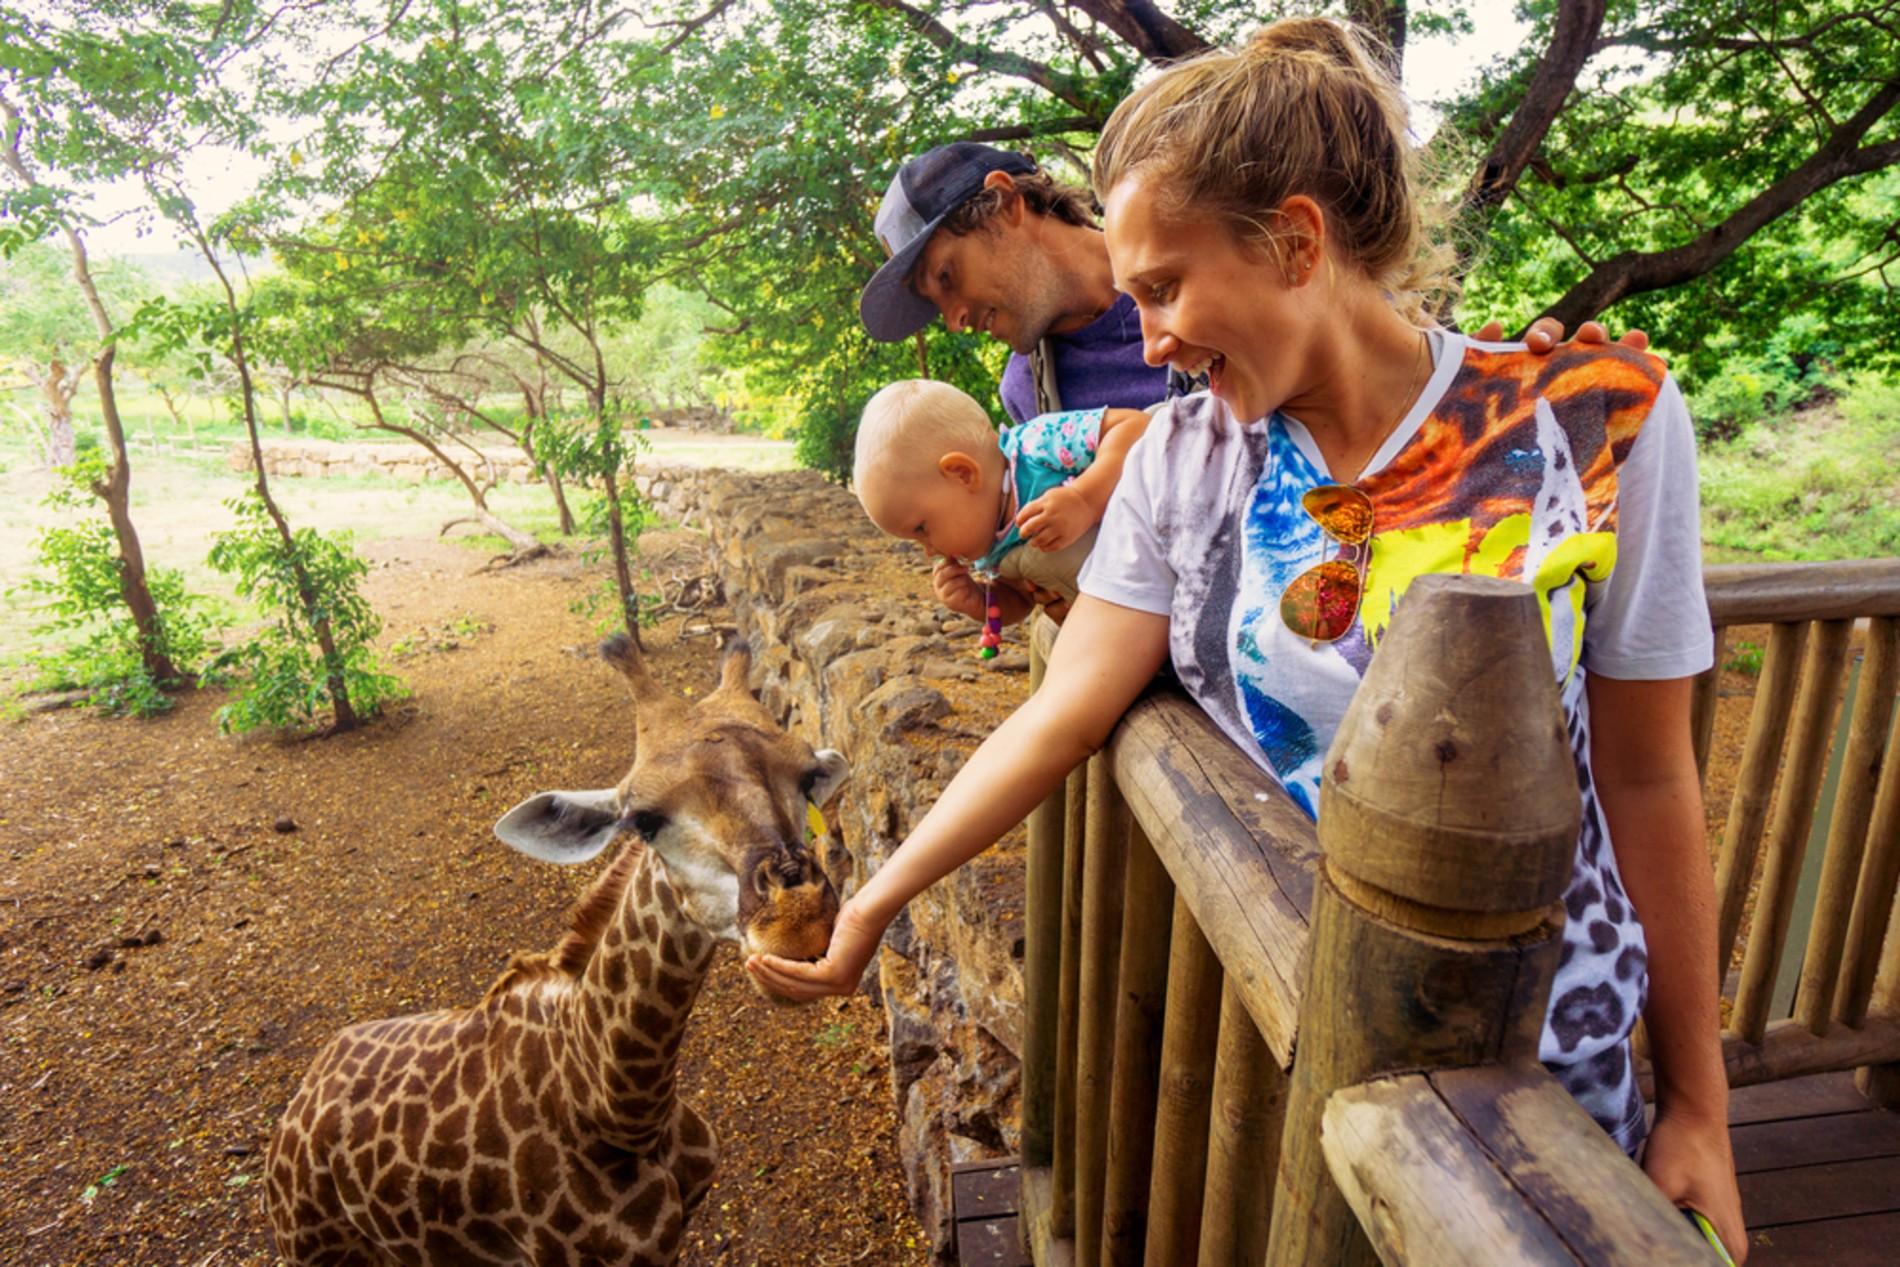 Feeding Giraffes in Nairobi